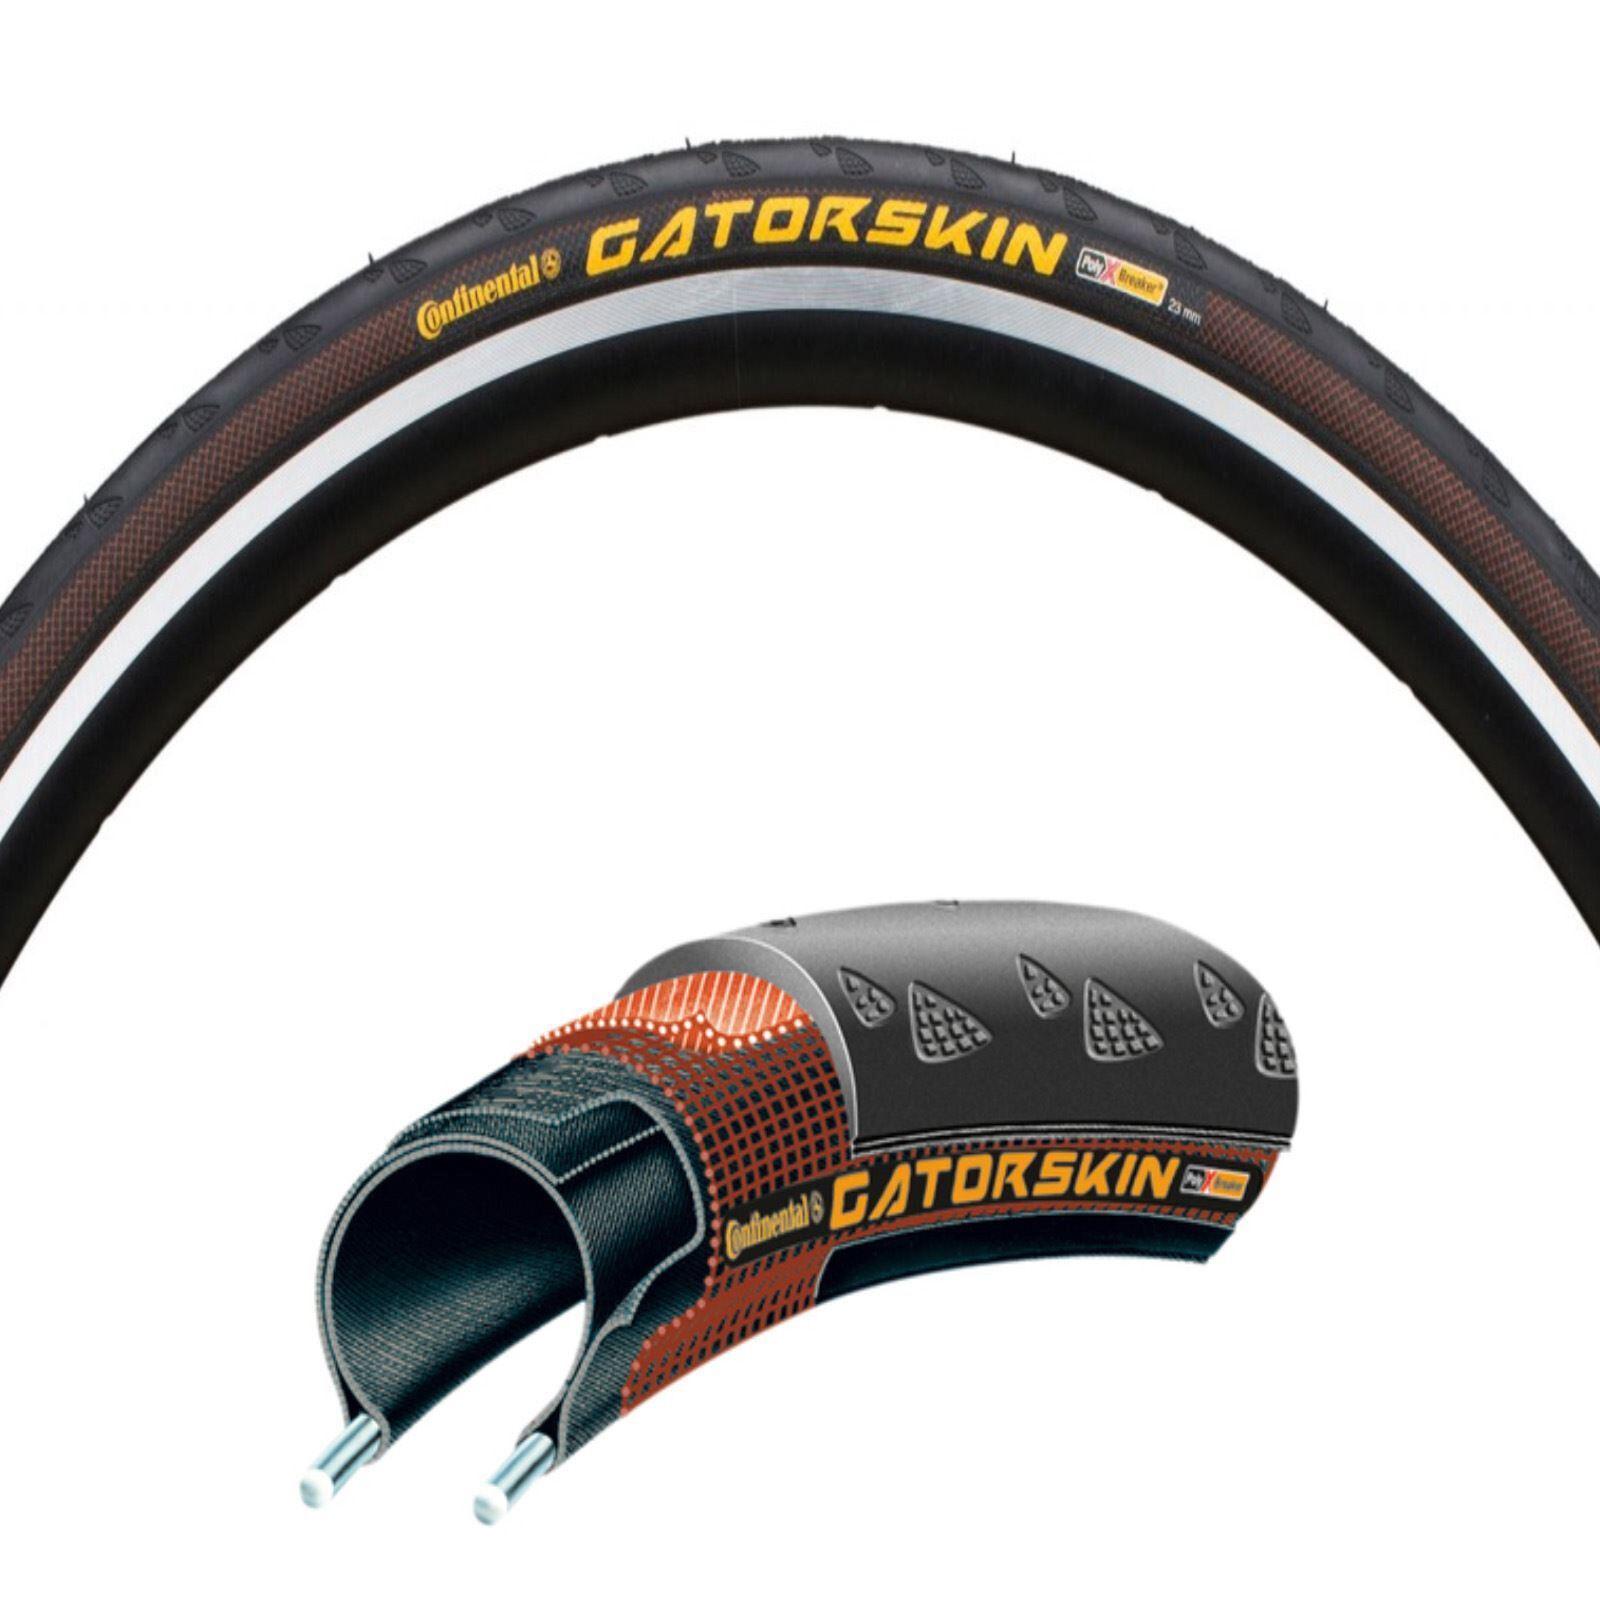 Continental Ultra GatorSkin DuraSkin Wired Road Bike Tyre 700c Bicycle Cycle